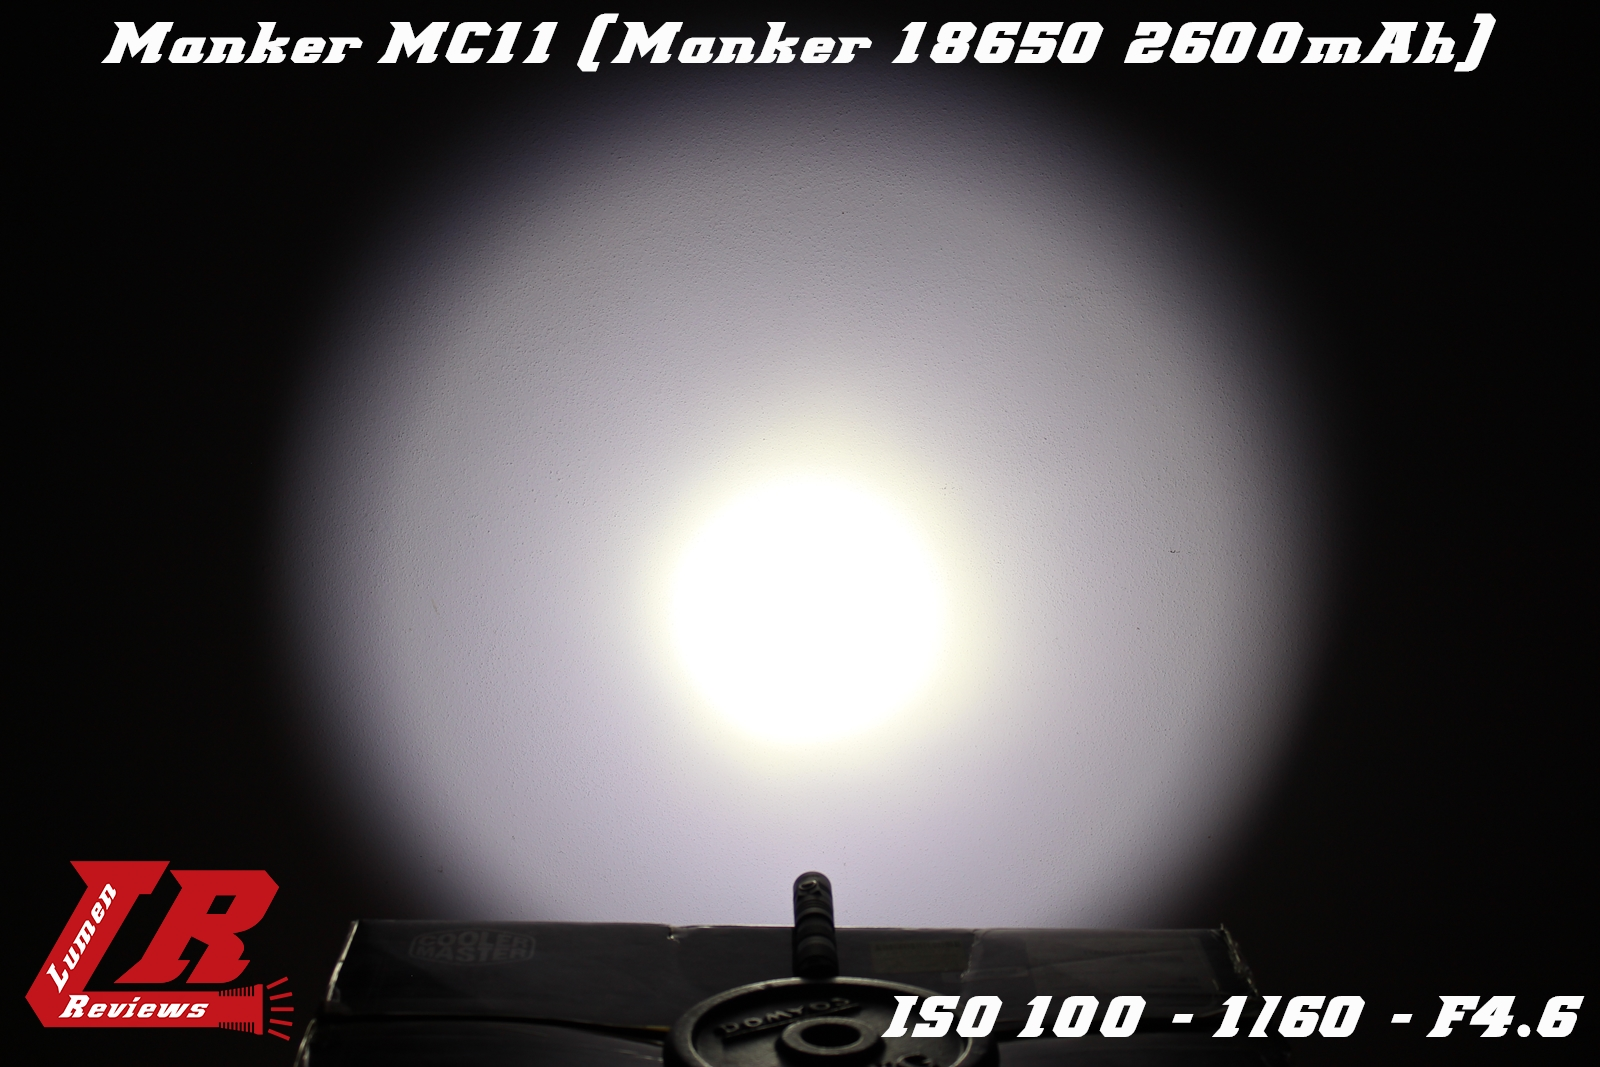 Manker MC11 BS 2